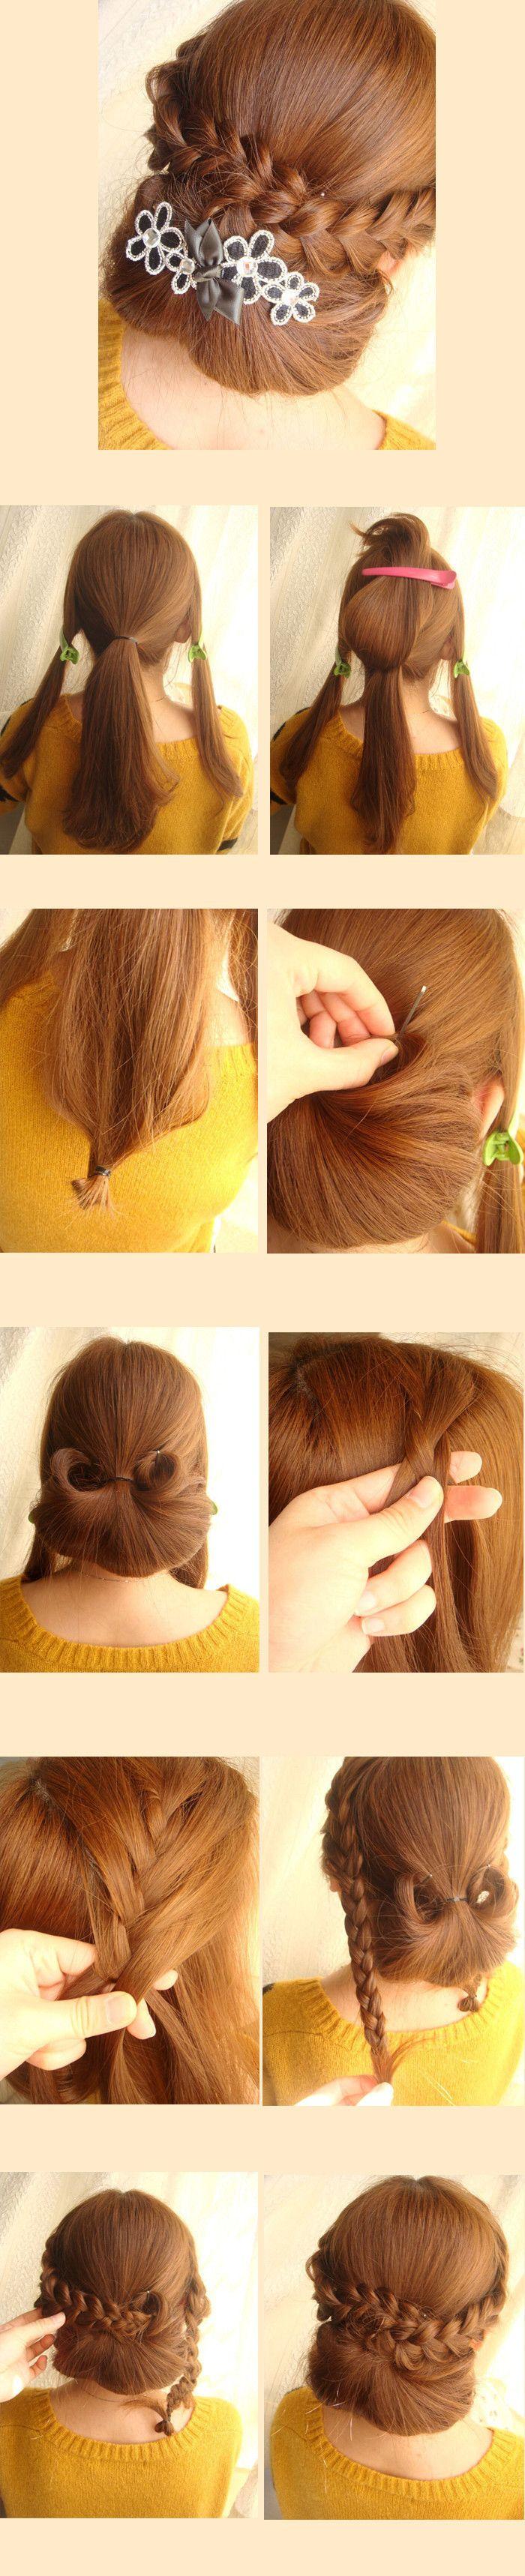 best braids images on pinterest hair dos braided